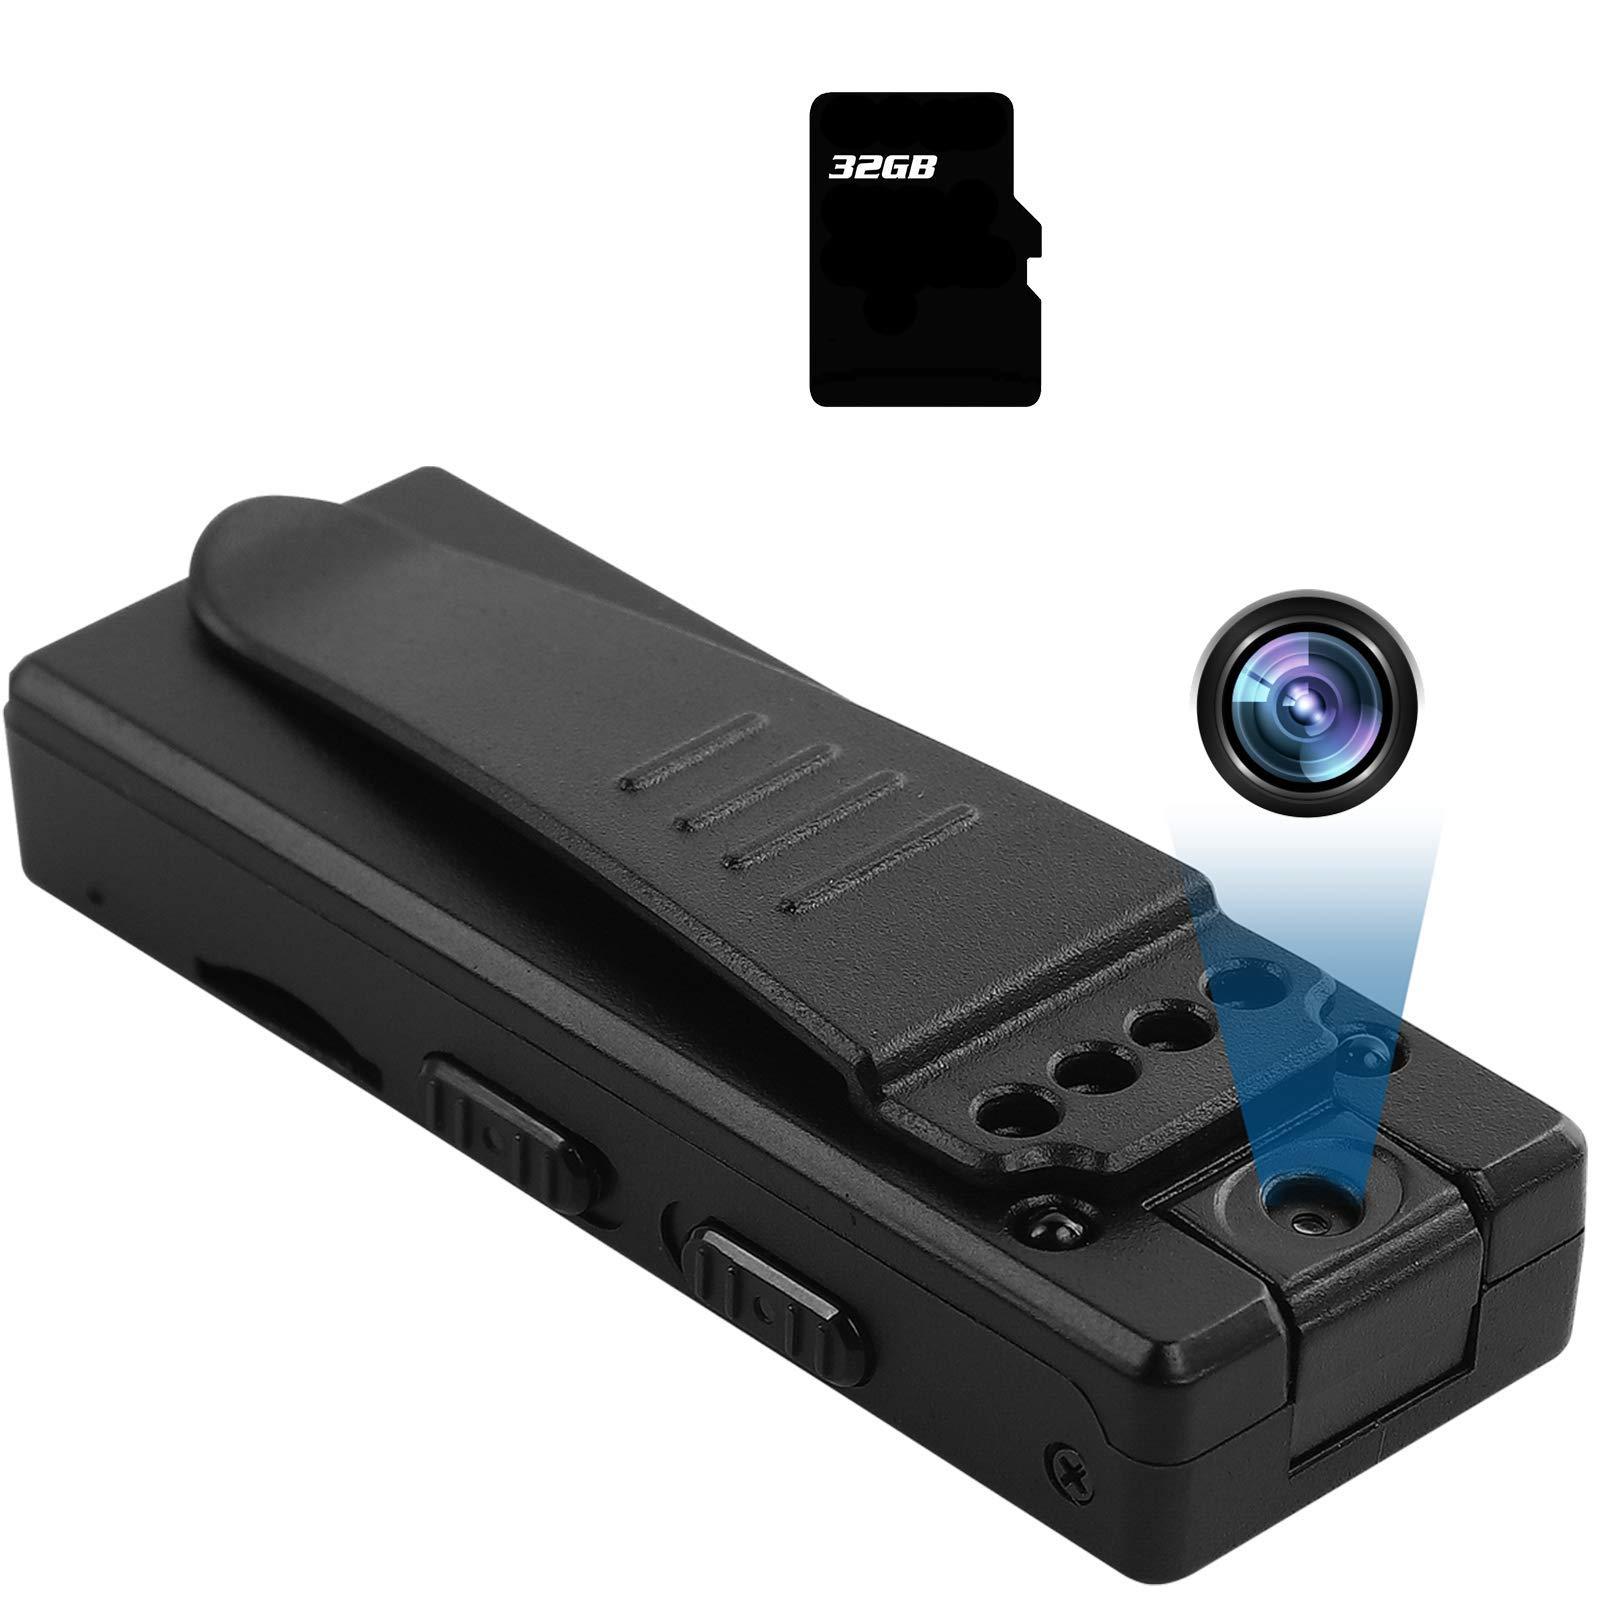 ATONGMU 1080P Rotatable Lens Mini Body Camera Clip Wearable Security Cameras Portable Pocket Cam Video Recorder Small Sport DV DVR Dash Camera for Car Bike Home Office (with 32G Card) M12-TFCA_01